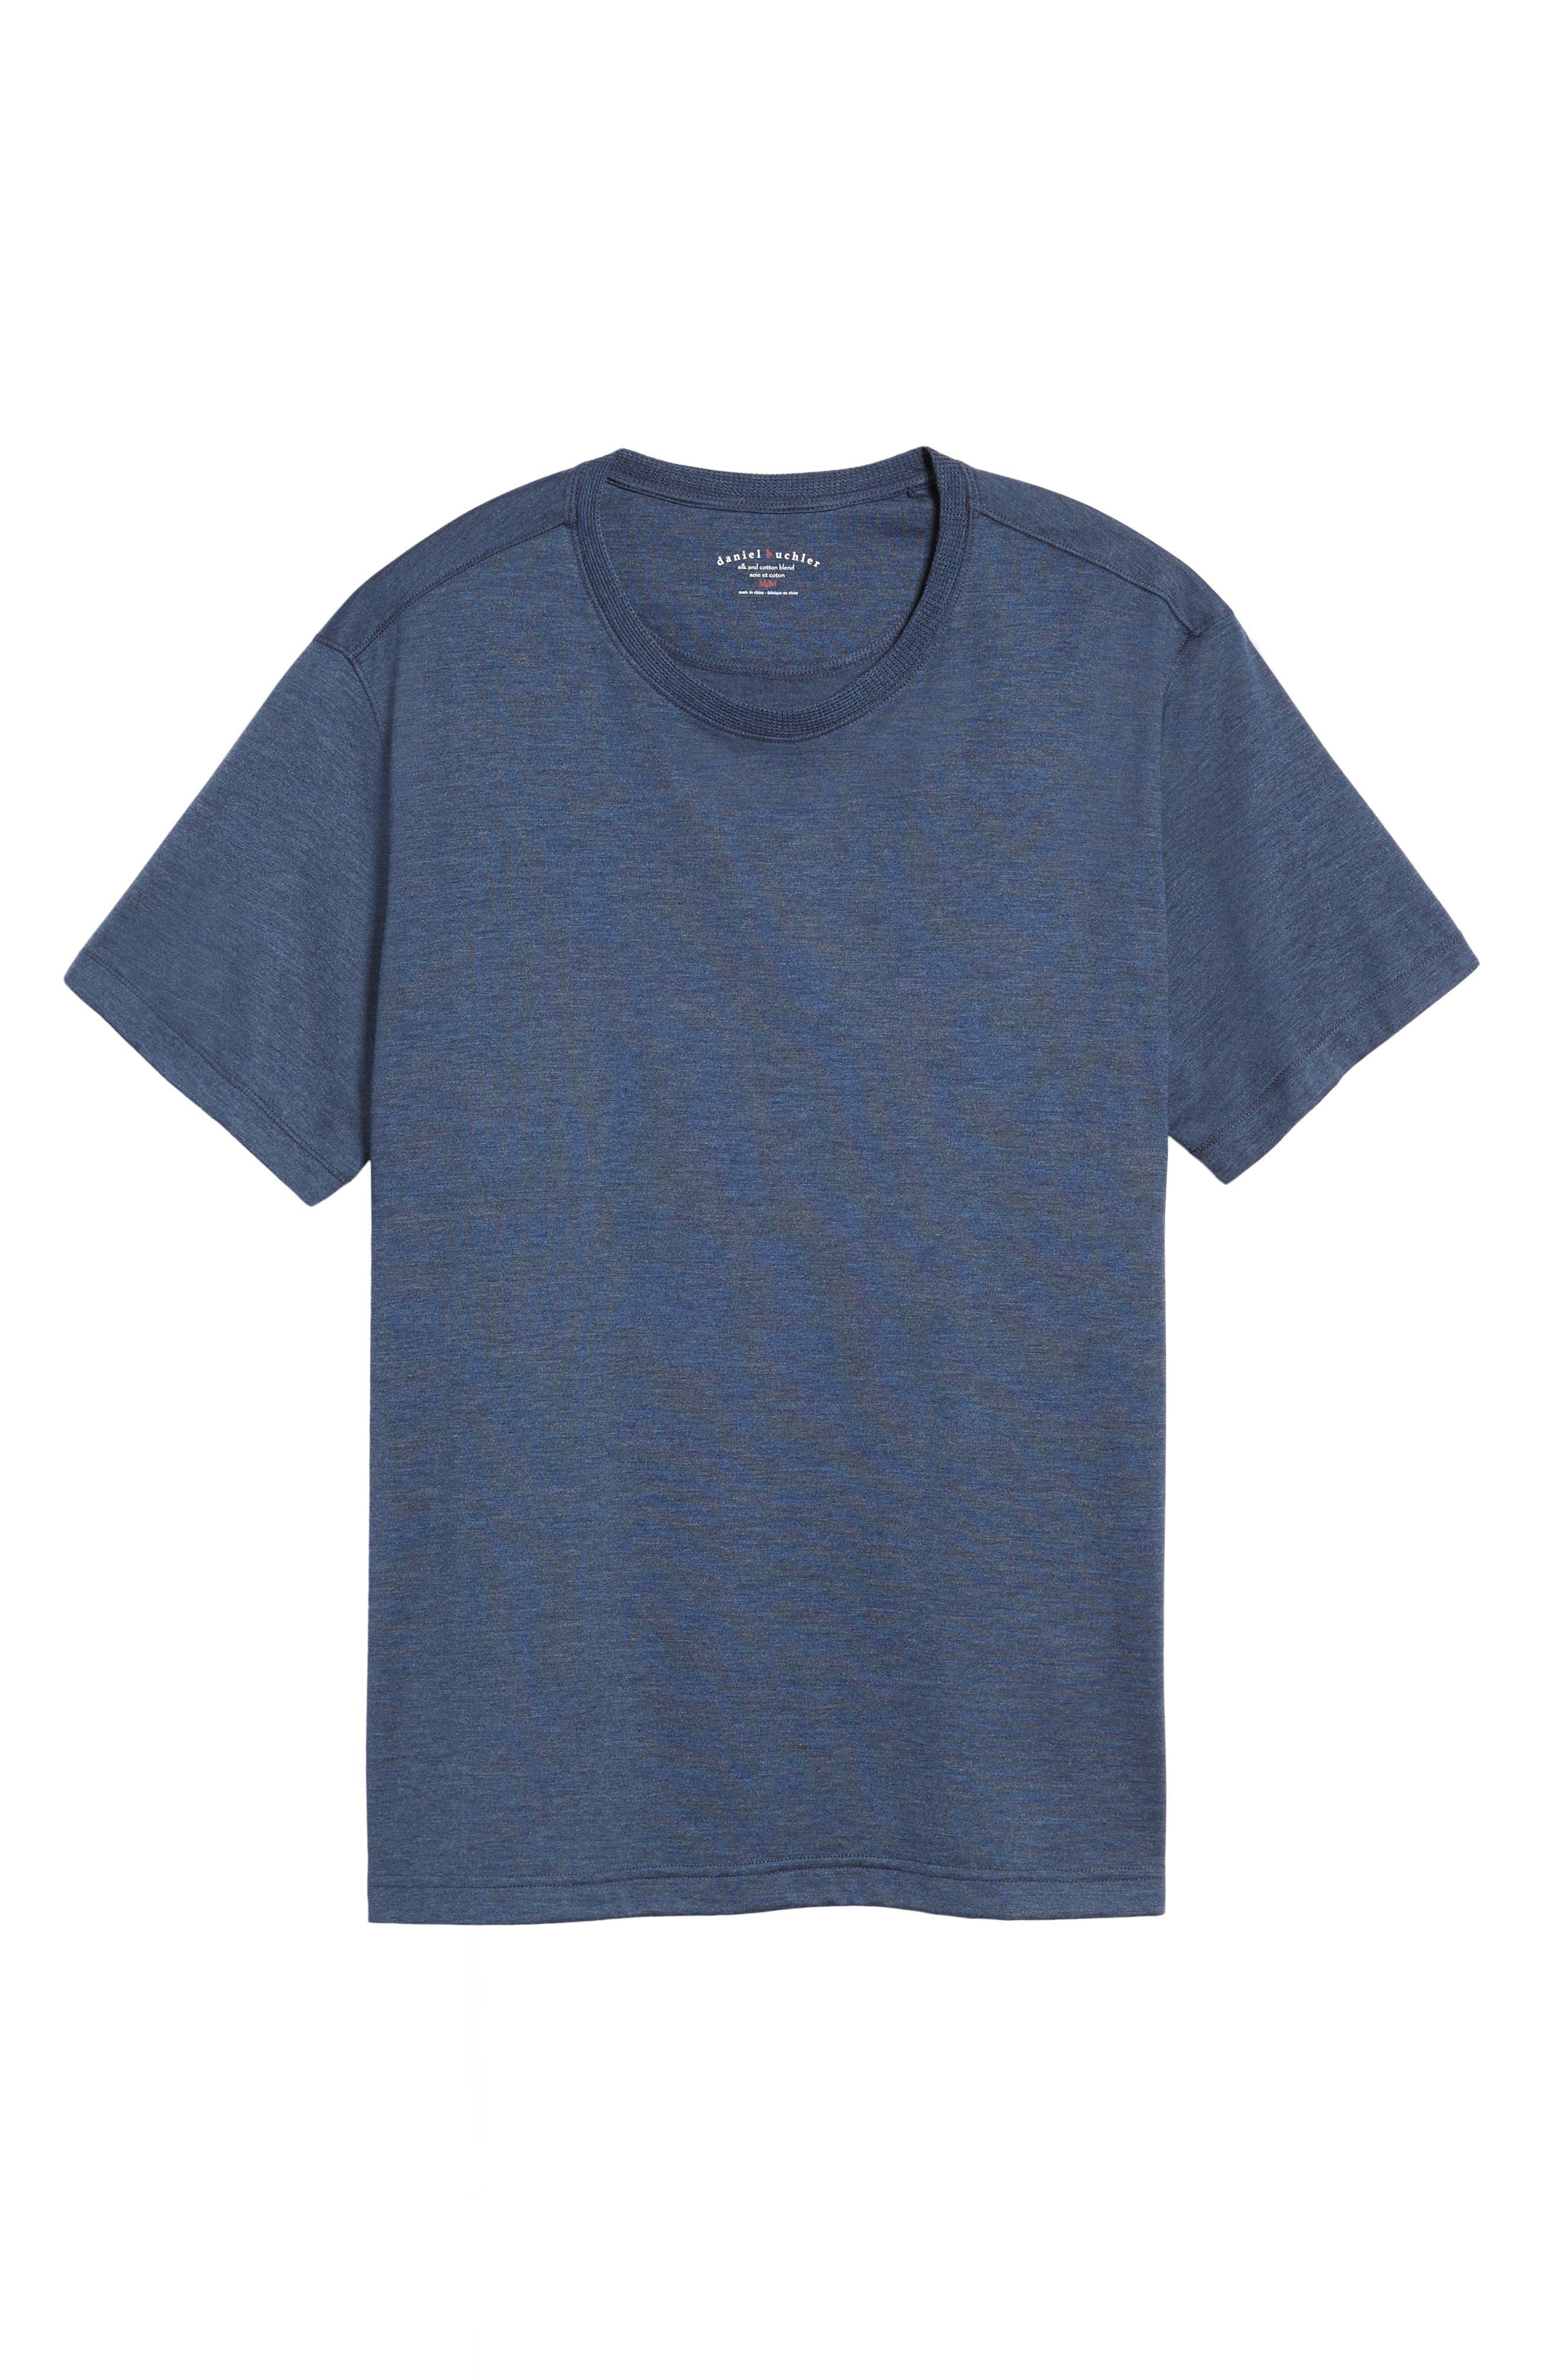 Silk & Cotton Crewneck T-Shirt,                             Alternate thumbnail 6, color,                             NAVY HEATHER